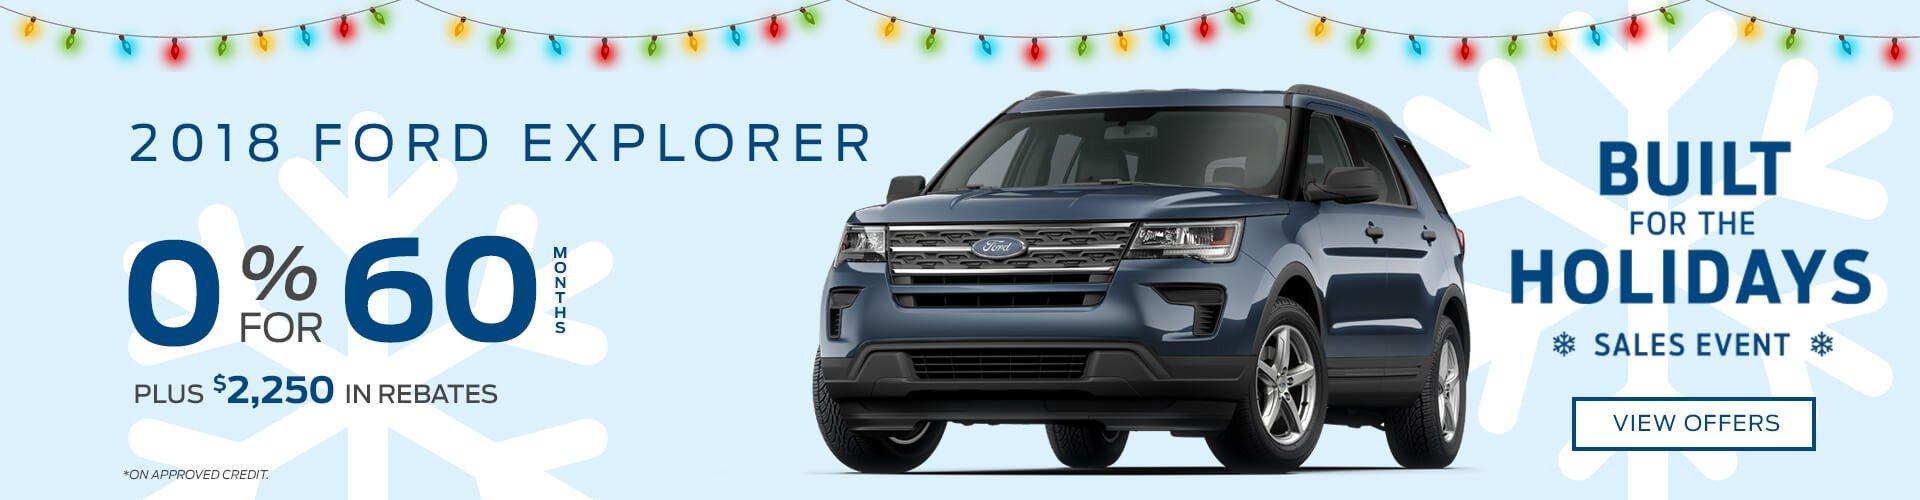 Special offer on 2018 Ford Explorer 2018 Ford Explorer